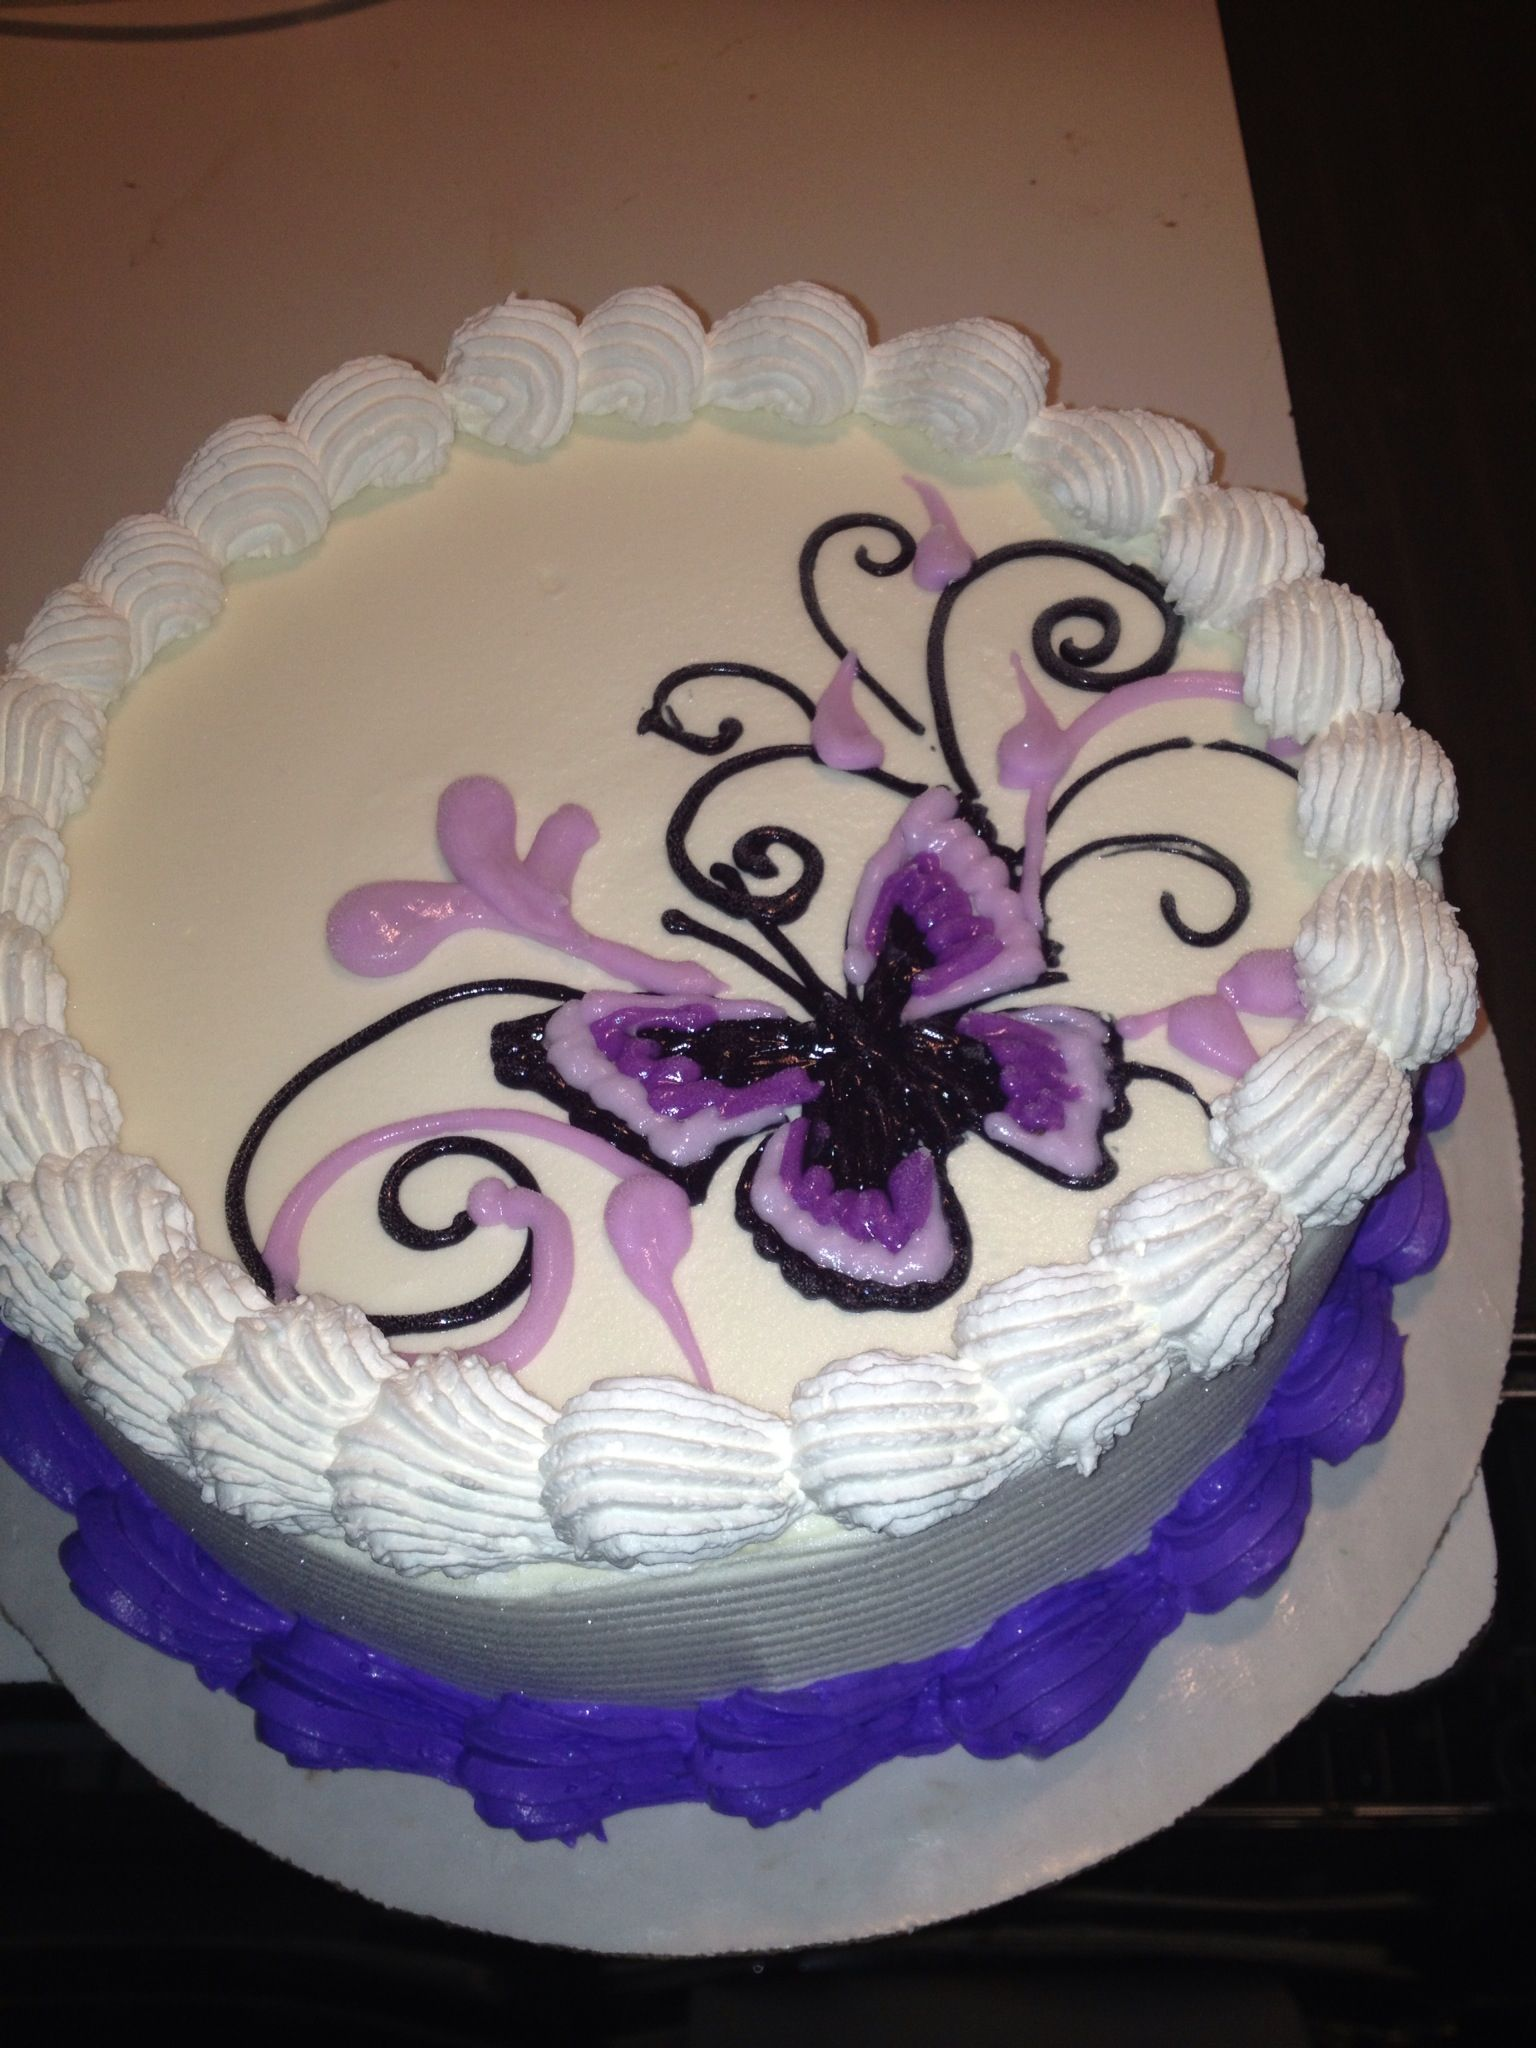 Dq cakesDairy Queen cake ideas Pinterest Dairy queen